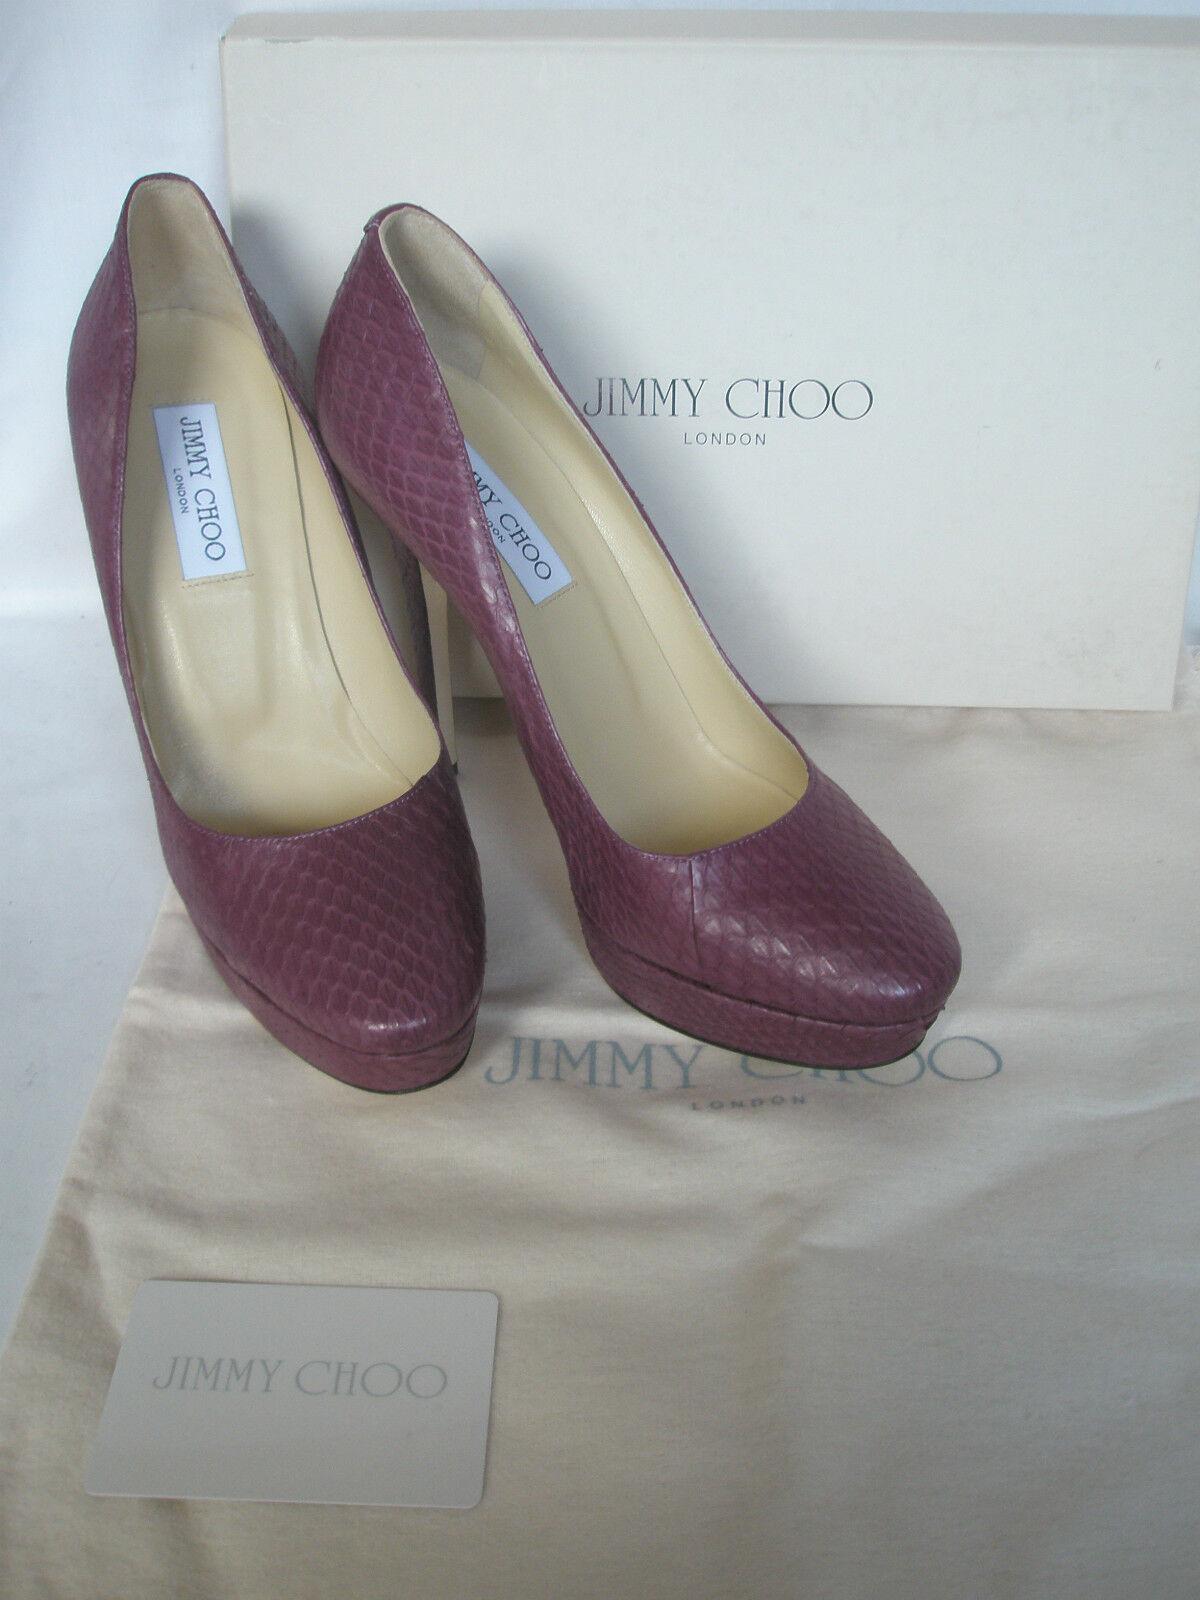 NEW JIMMY CHOO CHOO CHOO Ladies COSMIC Plum Court Snake Leather shoes Heels UK 7 EU 40 c263db